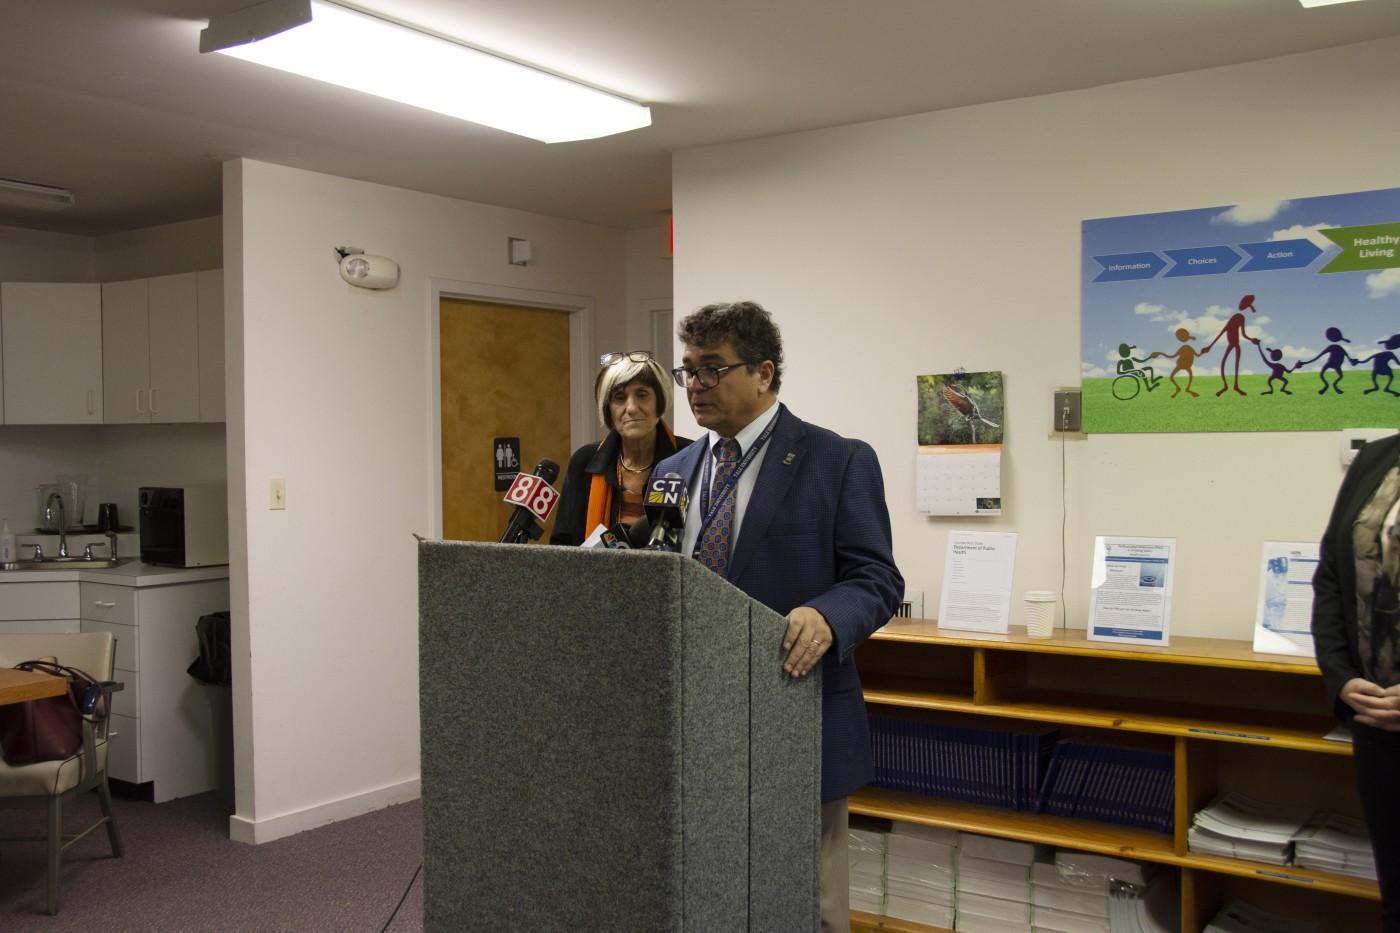 Vasilis Vasiliou, chair, Department of Environmental Health Sciences